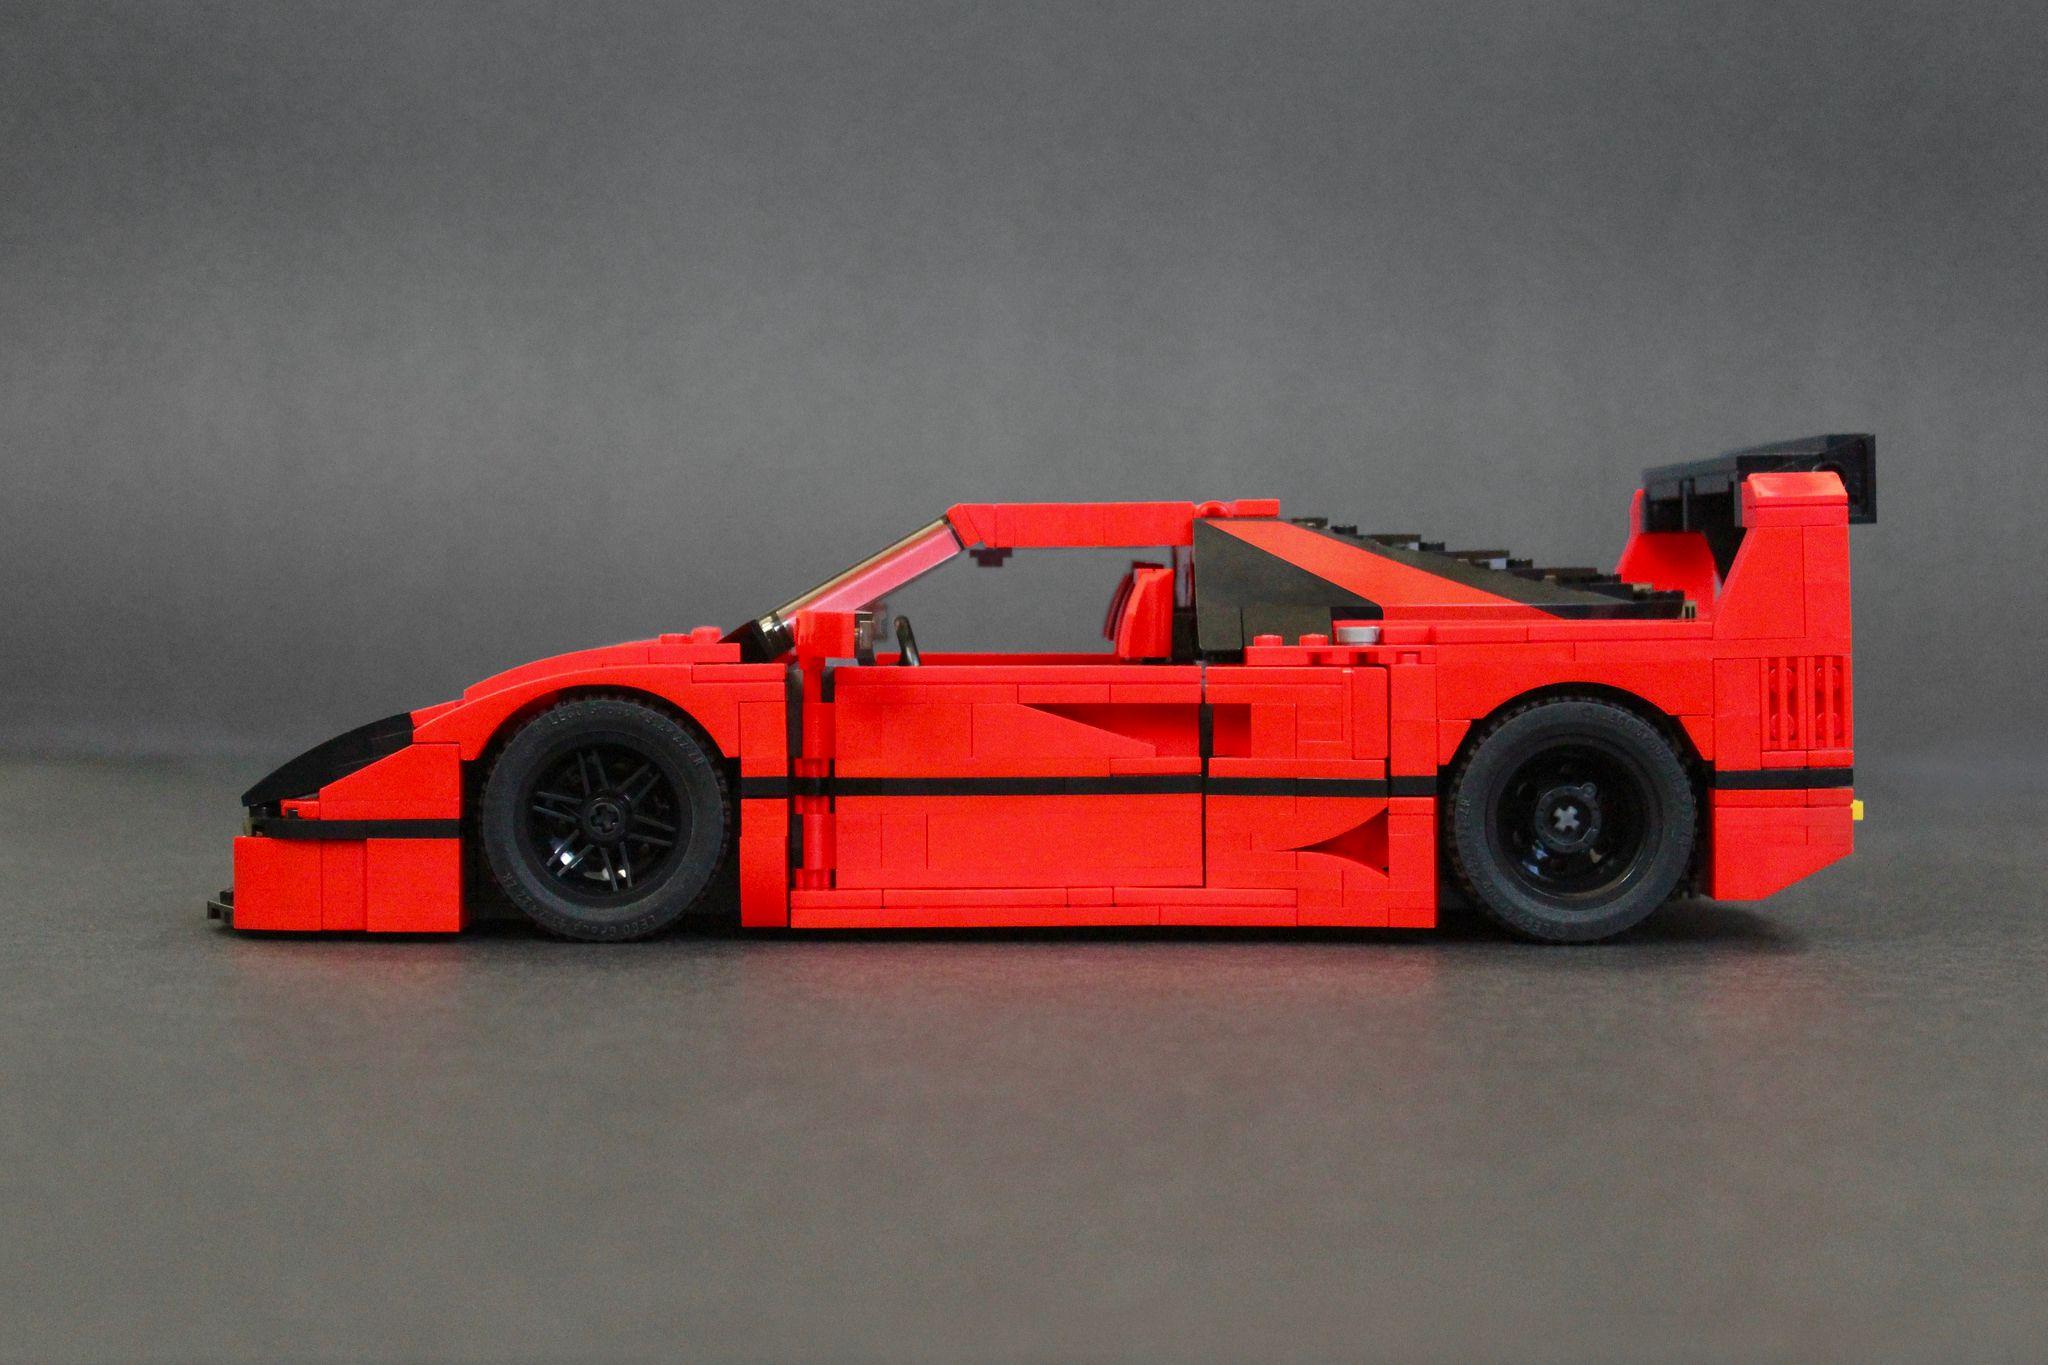 ferrari f40 lm super mod same but different lego cars pinterest ferrari f40 and lego. Black Bedroom Furniture Sets. Home Design Ideas